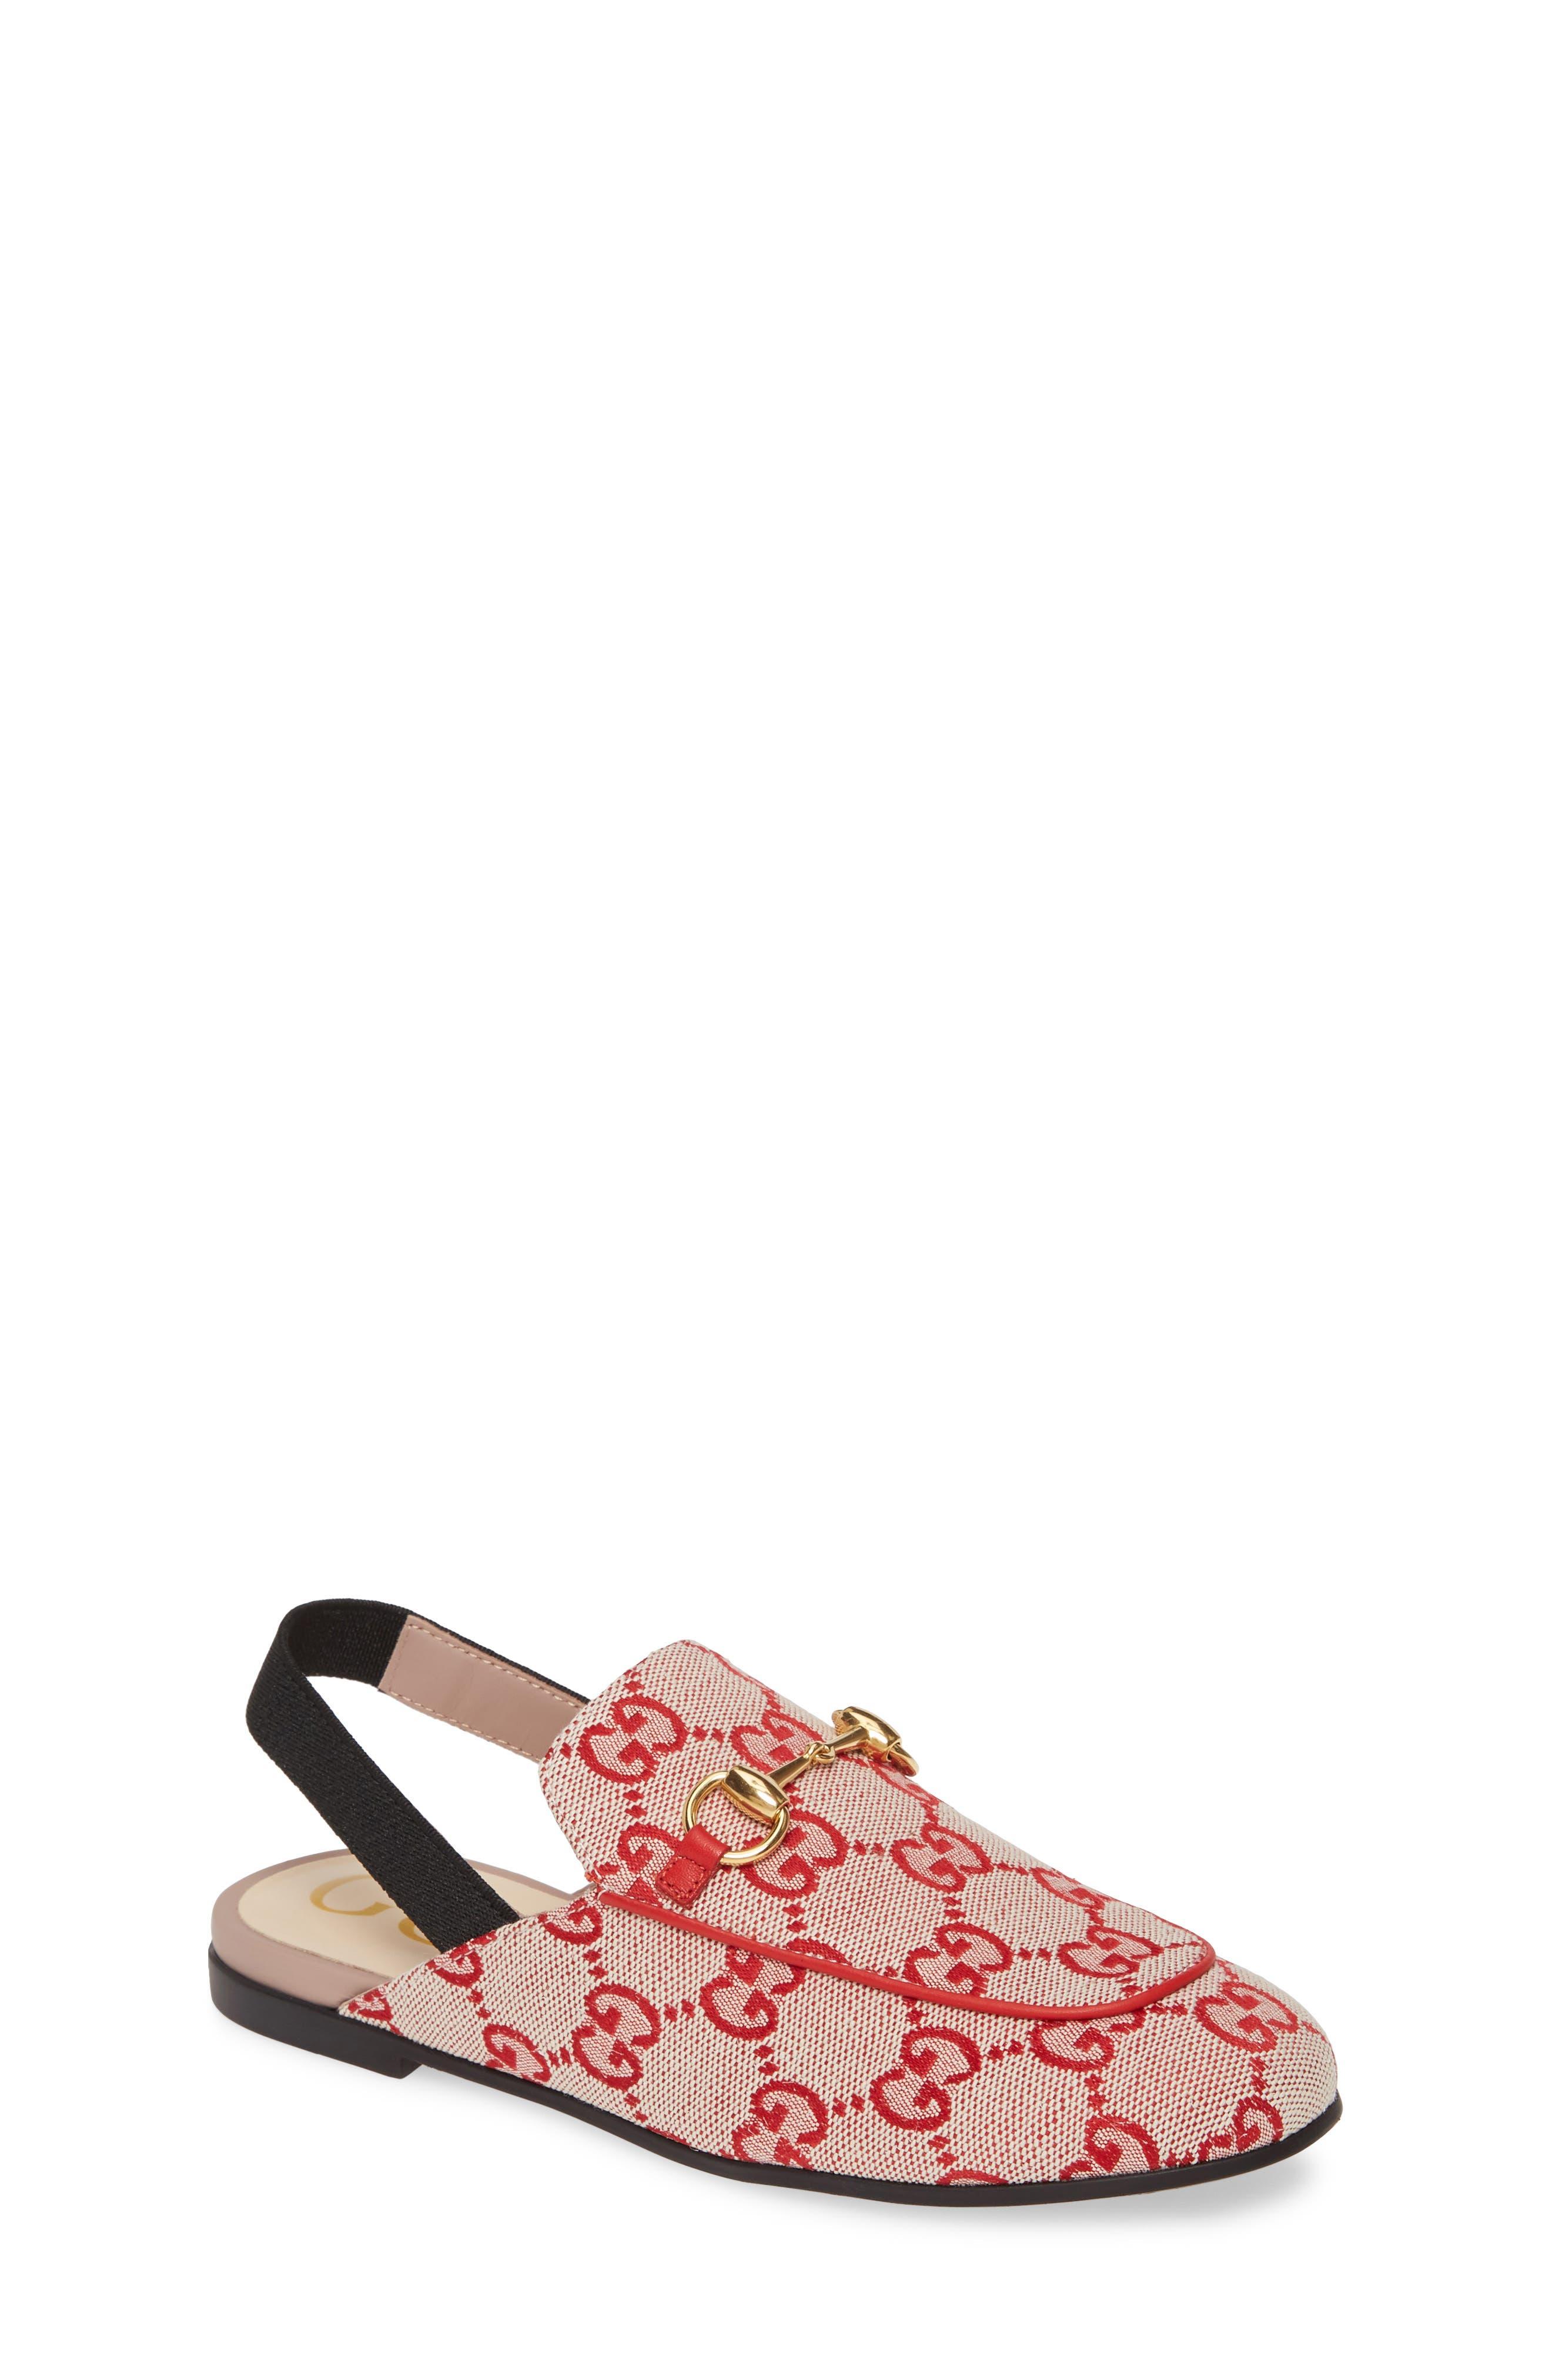 Kids Sandals' Gucci Shoes | Nordstrom